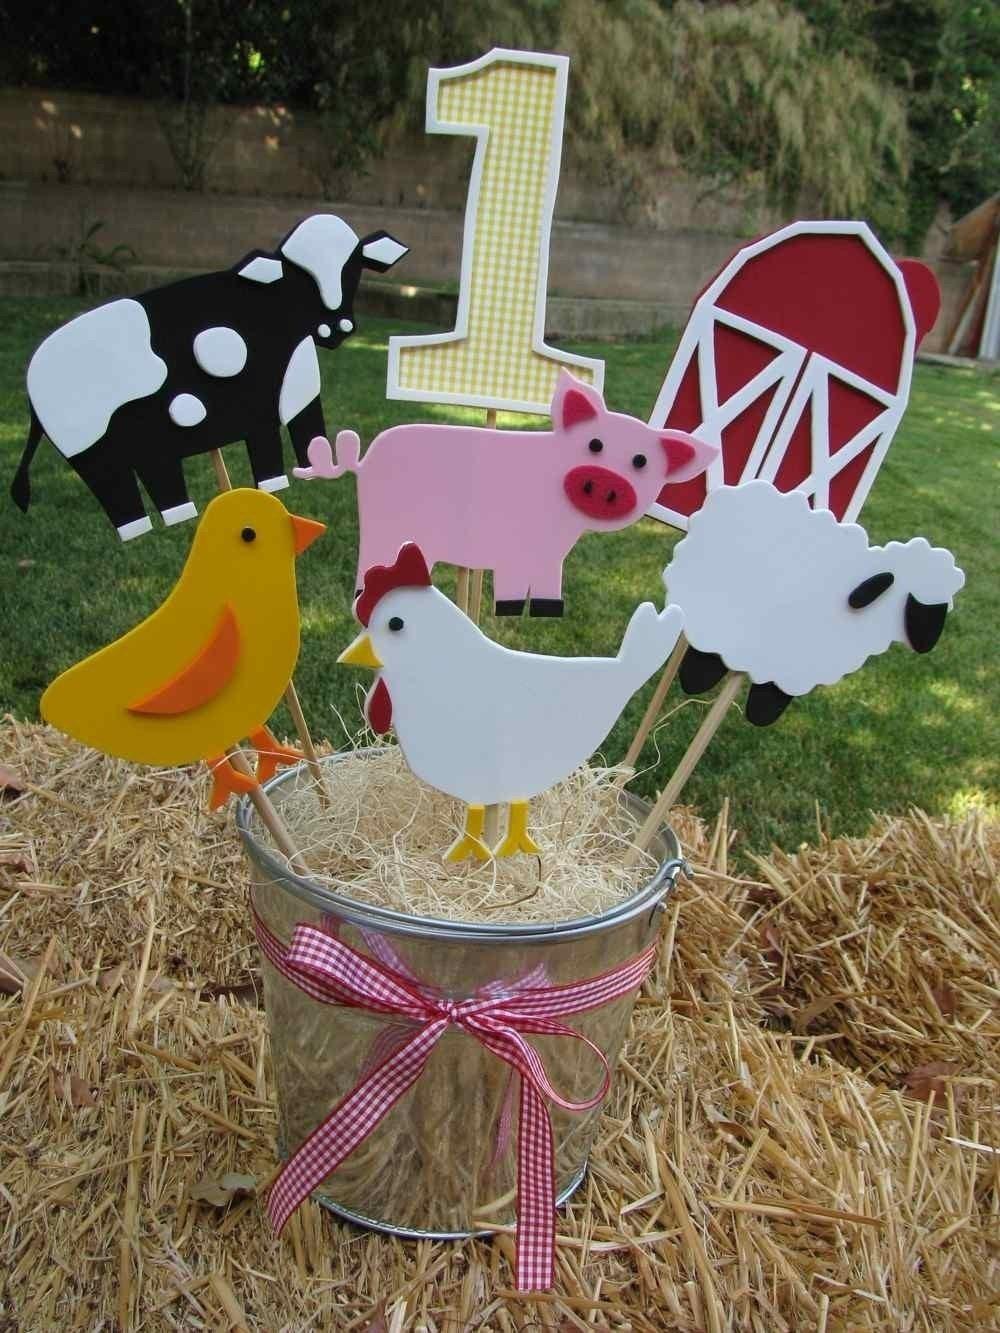 Barn Farm Theme Centerpiece Decorations-RESERVED for MegSmilin